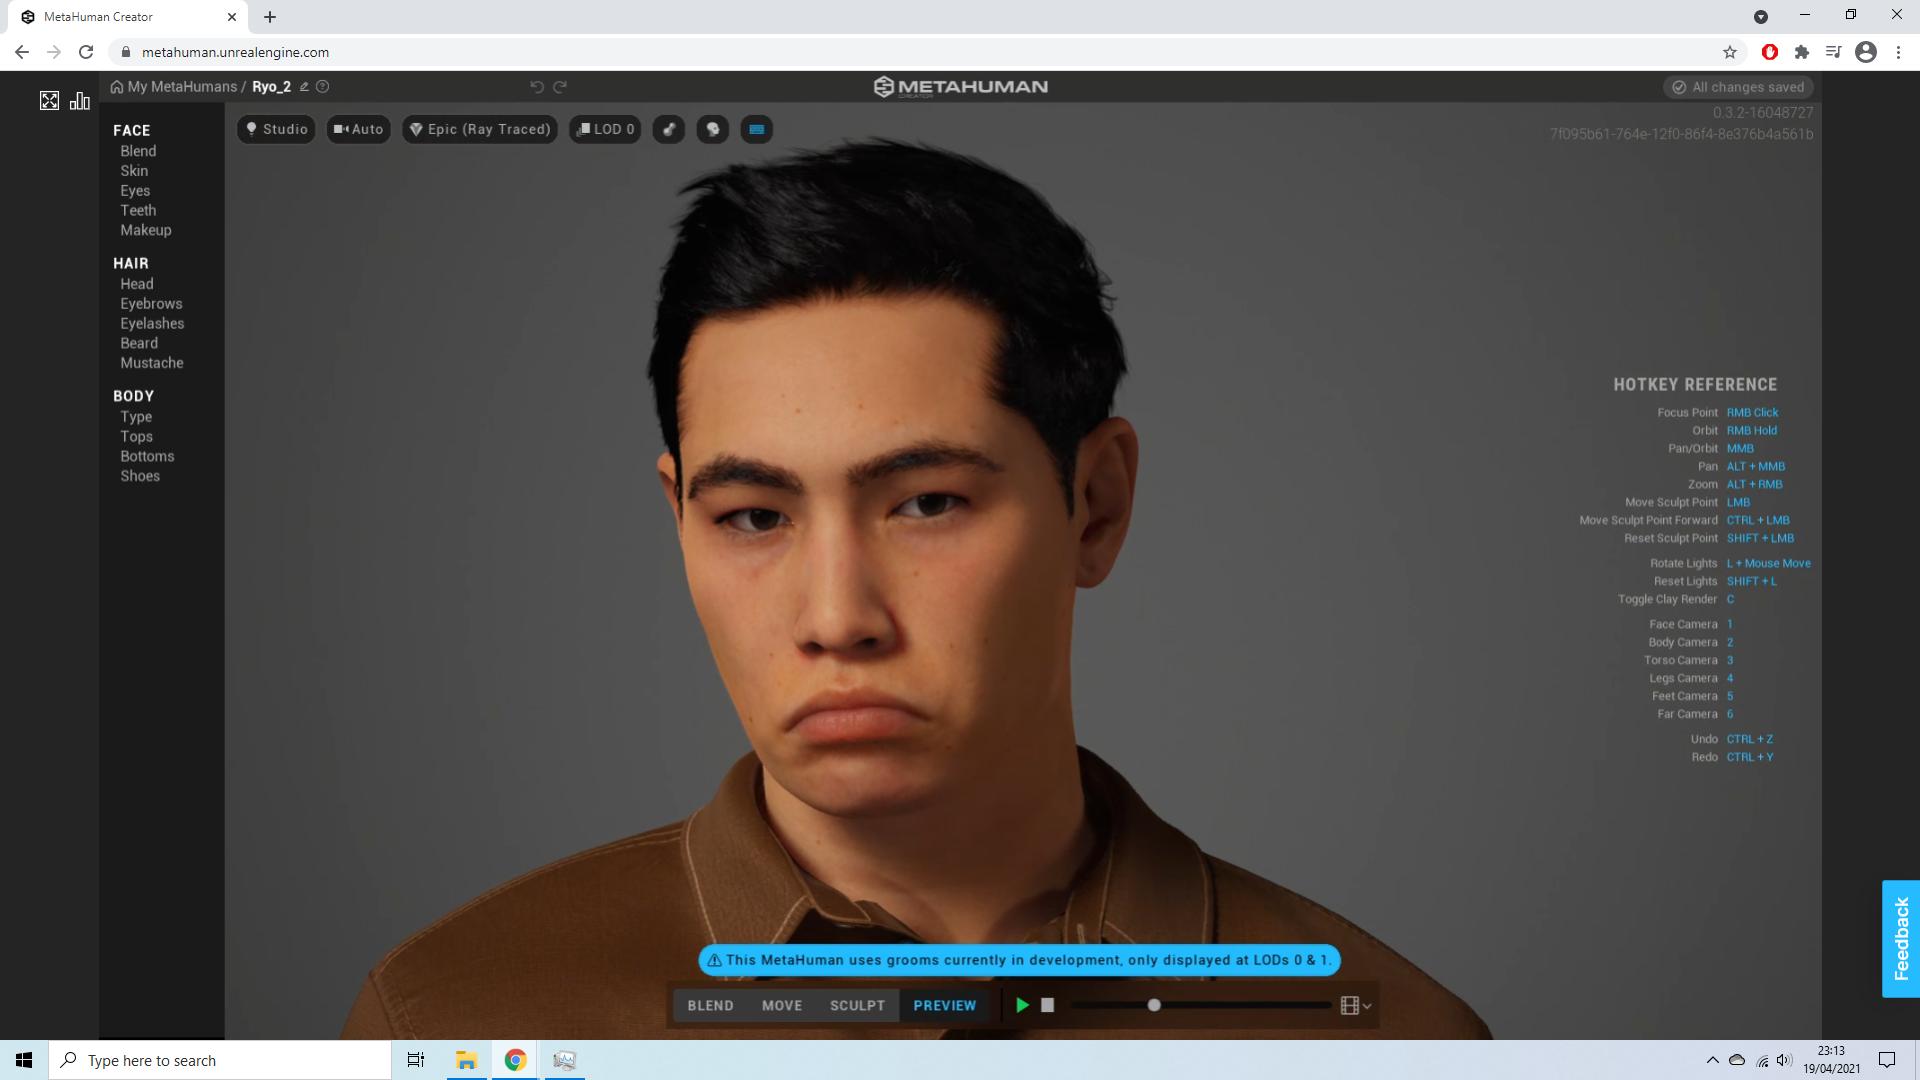 desktopscreenshot2021u9kd6.png